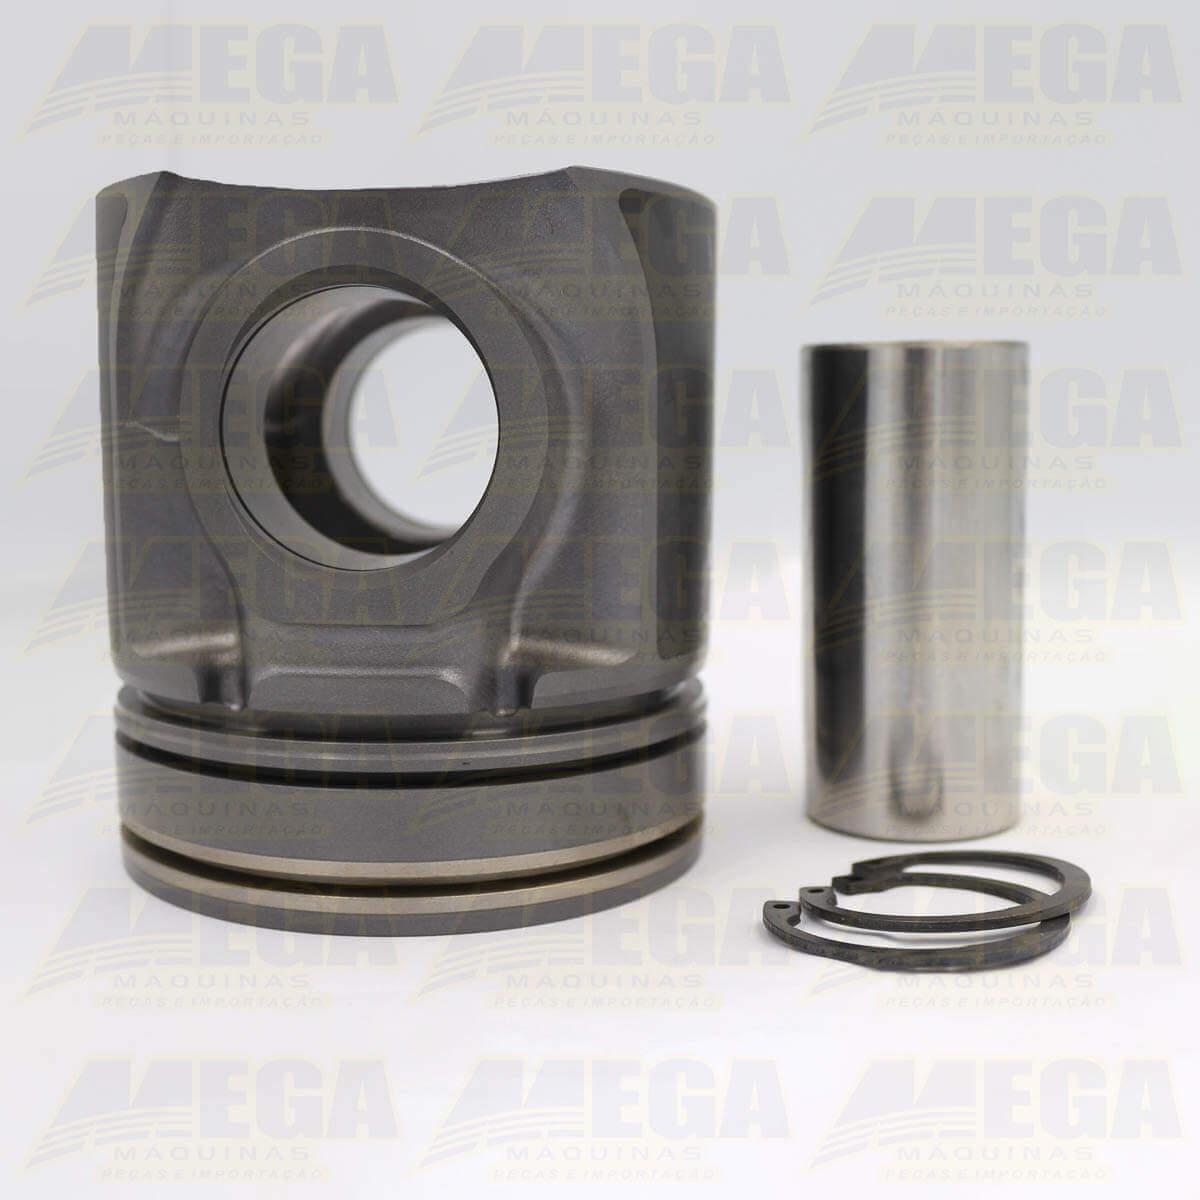 Kit Pistão com Anéis Motor DieselMax 444 Aspirado - 320/09210